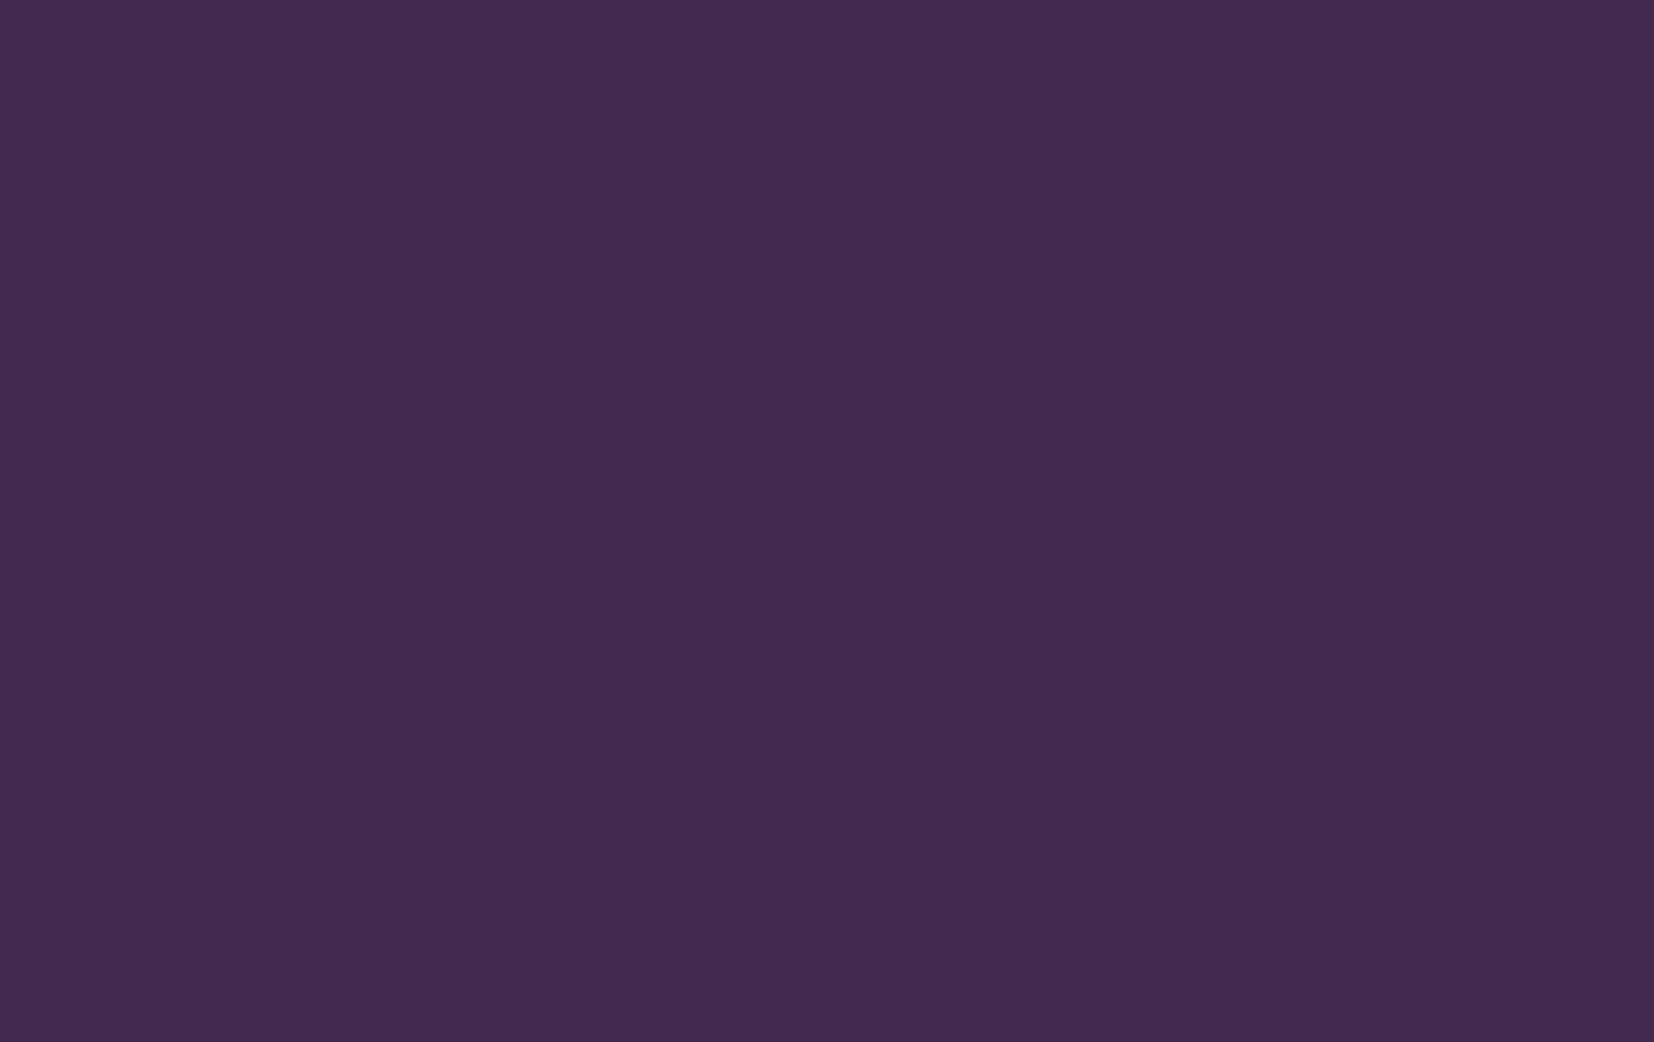 Purple Roller Shades : Cheapest blinds uk ltd purple roller blind